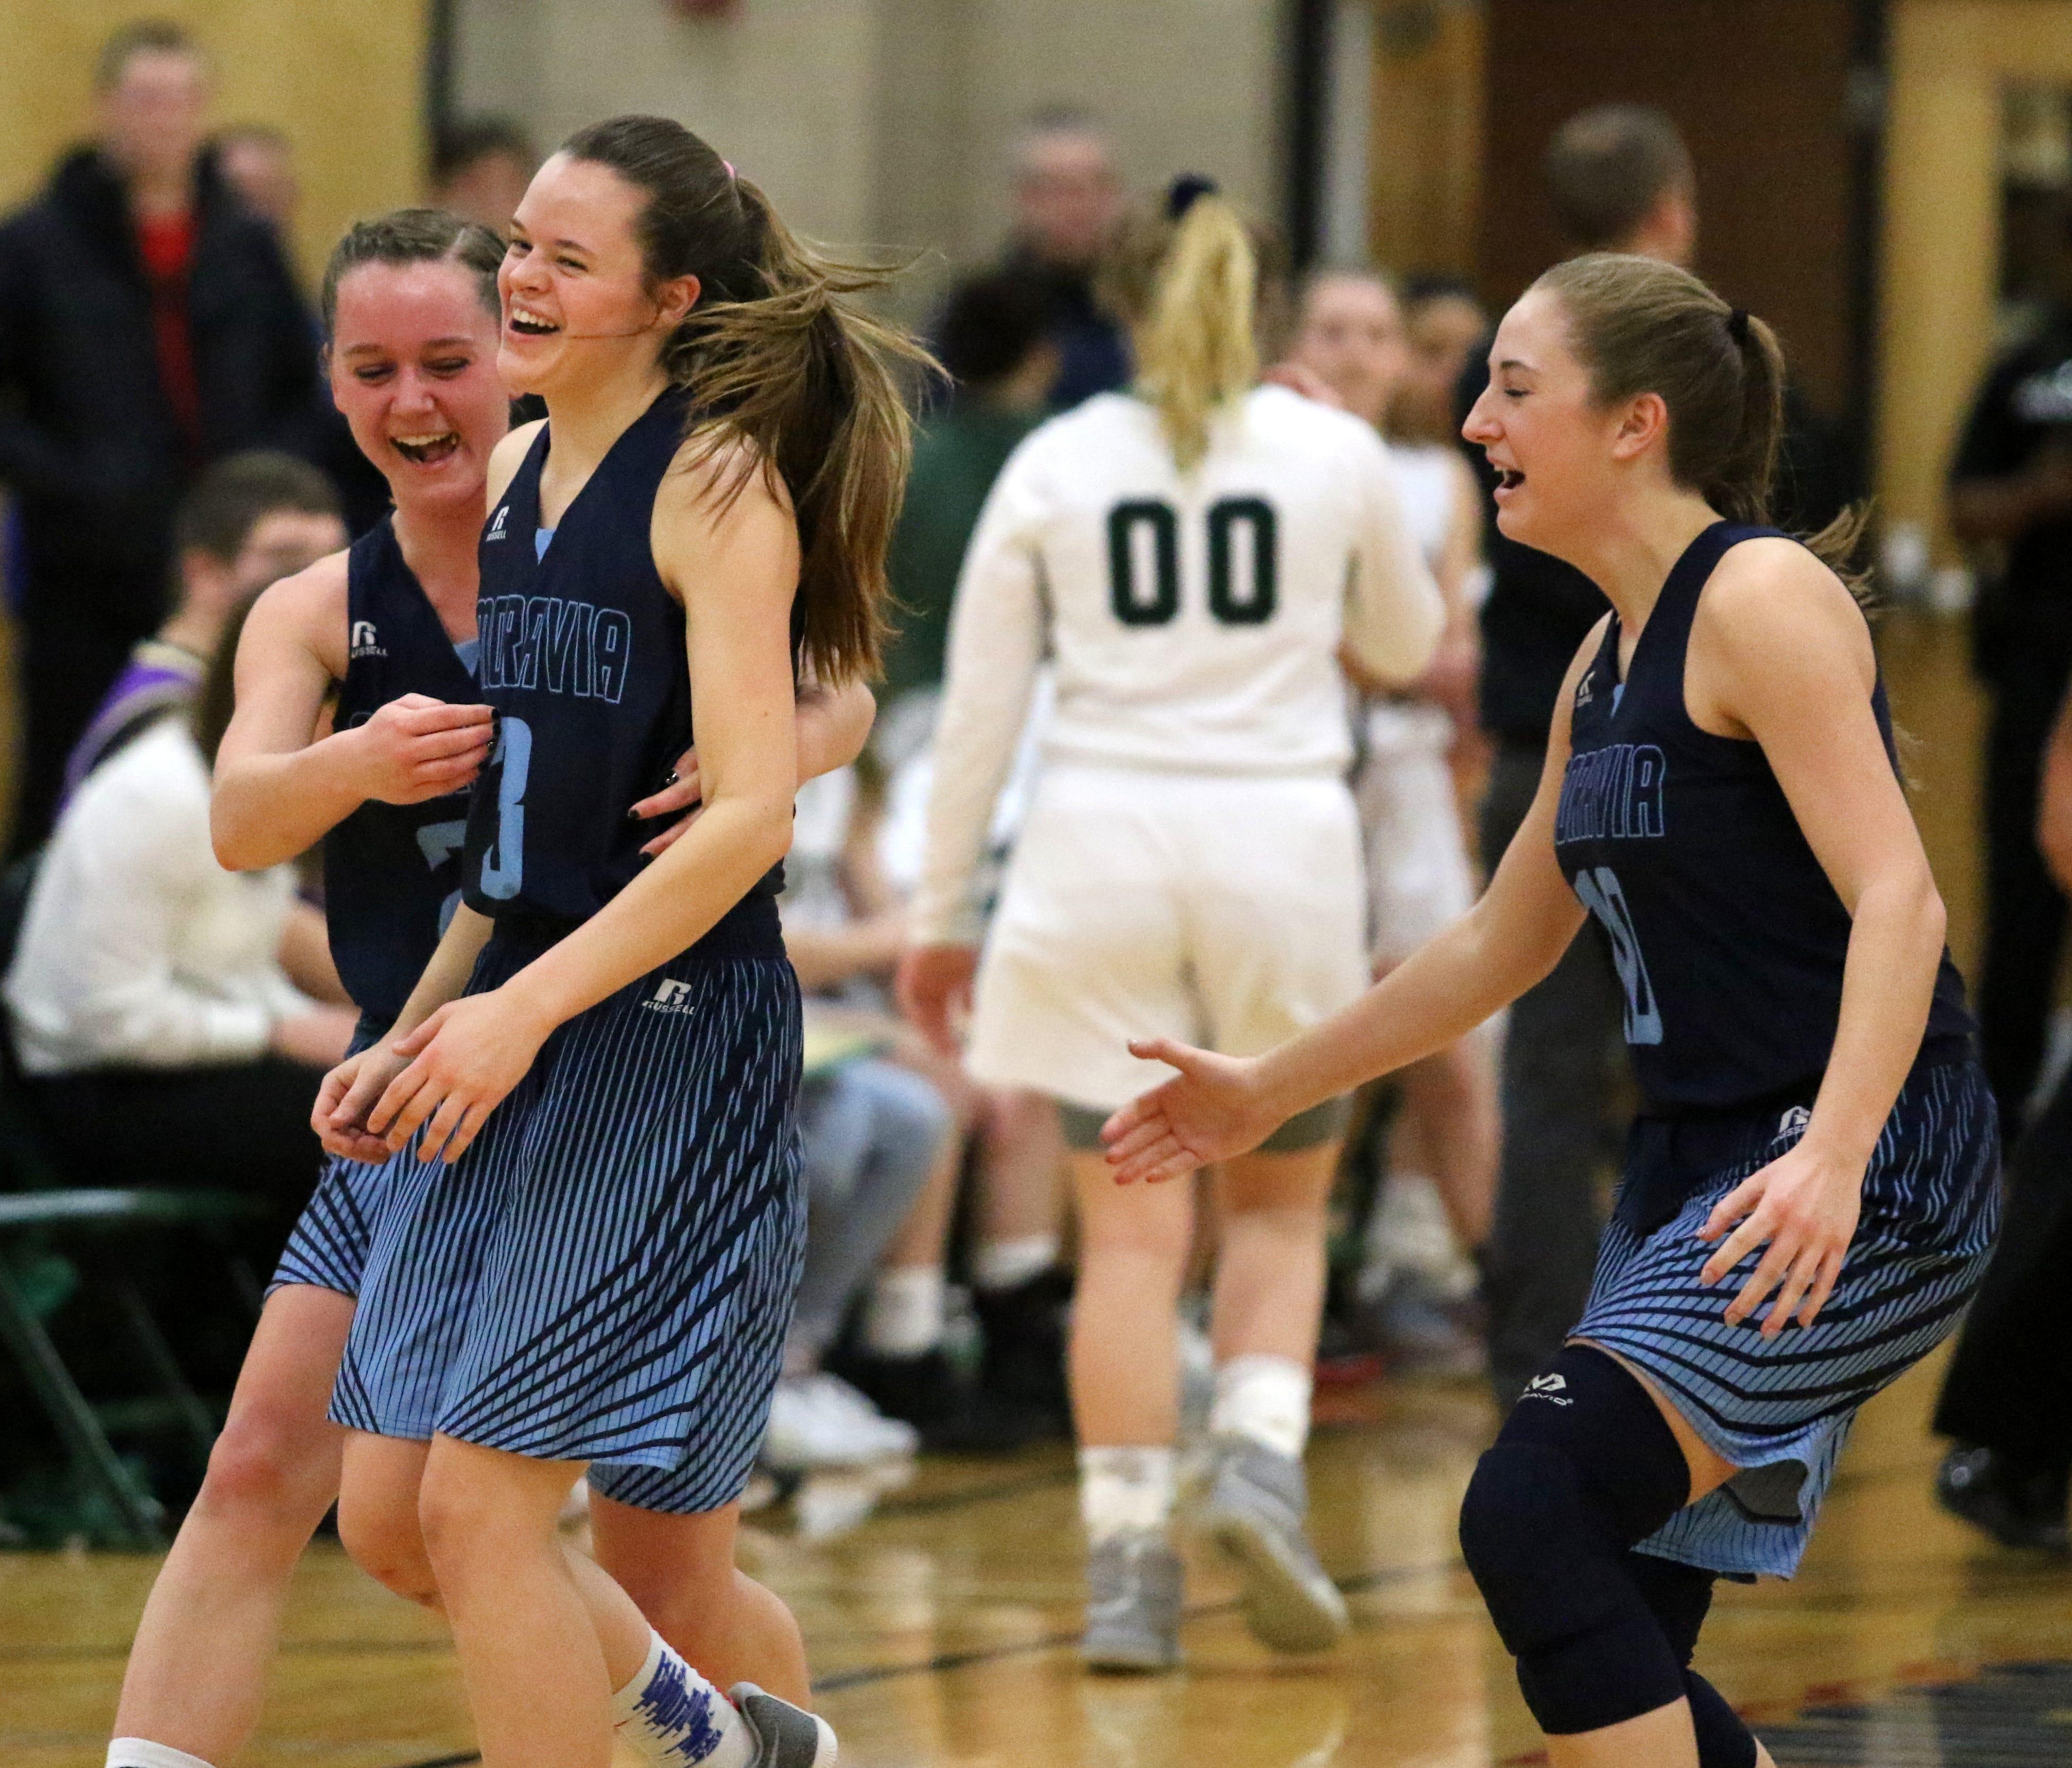 Girls basketball: Moravia avenges loss to Newfield, earns fifth straight IAC crown